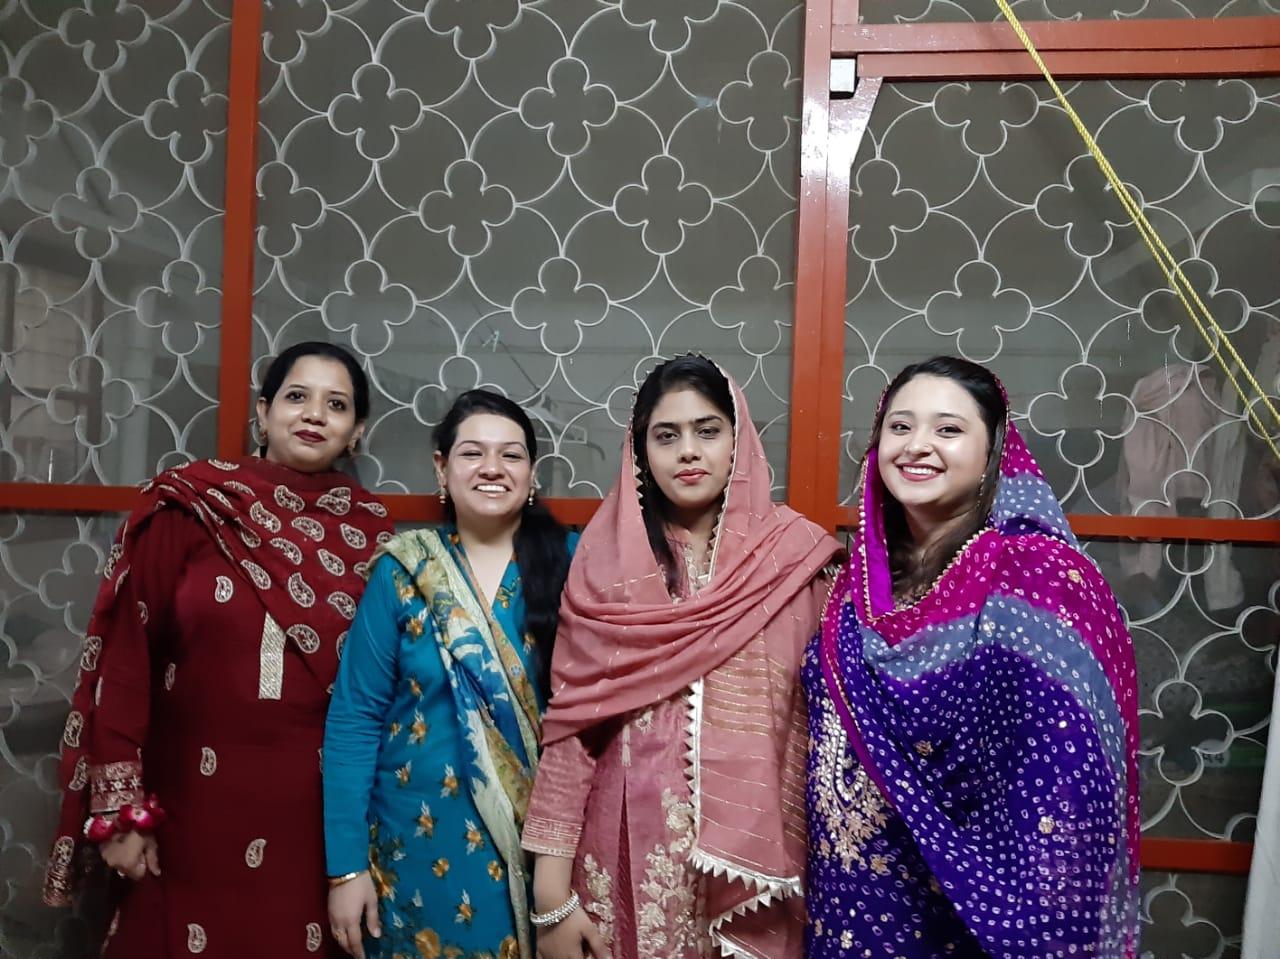 Erum, Faryal, Bushra, and Samia at the Lal Khat Ceremony